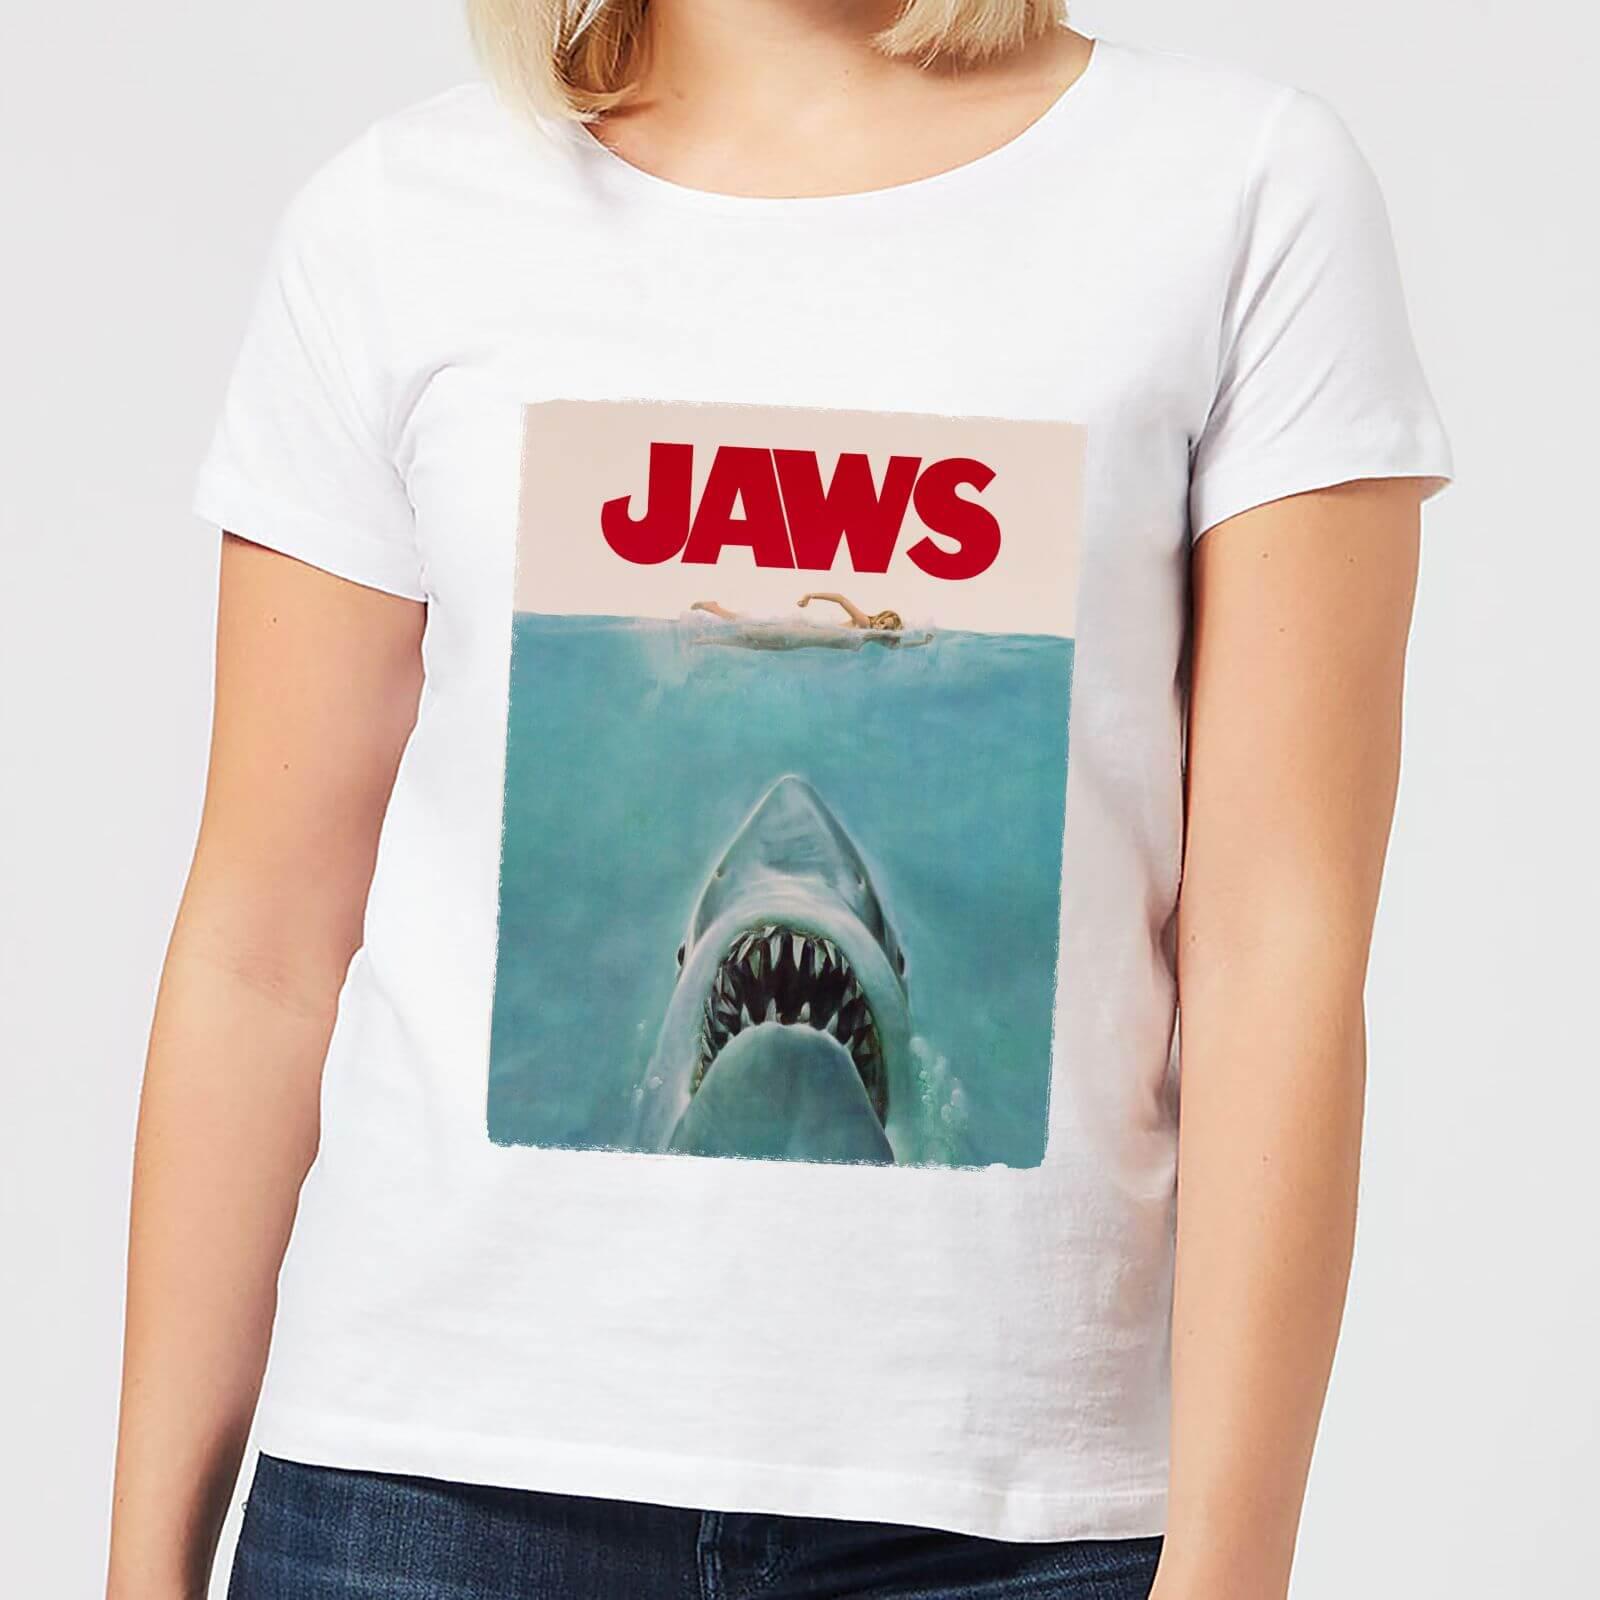 Jaws Classic Poster Women's T-Shirt - White - 3XL - White